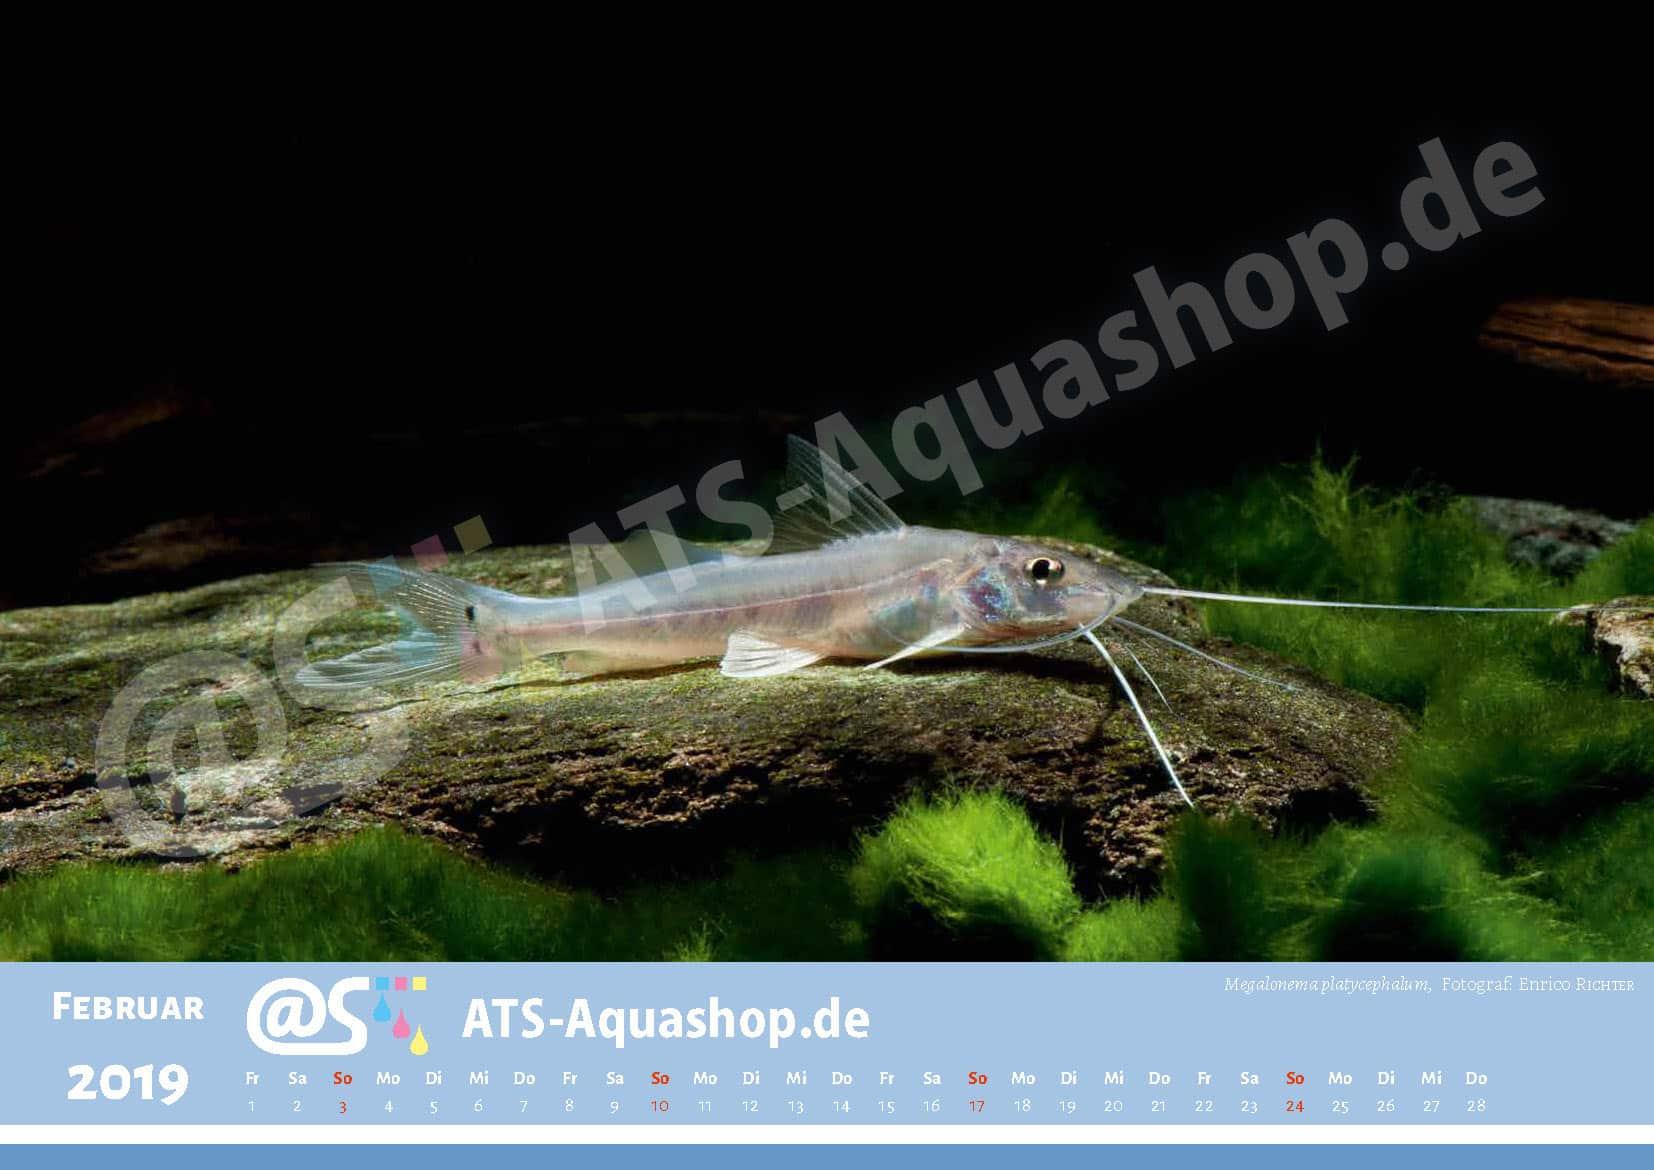 Photo calendar 2019 DIN A3: Megalonema platycephalum